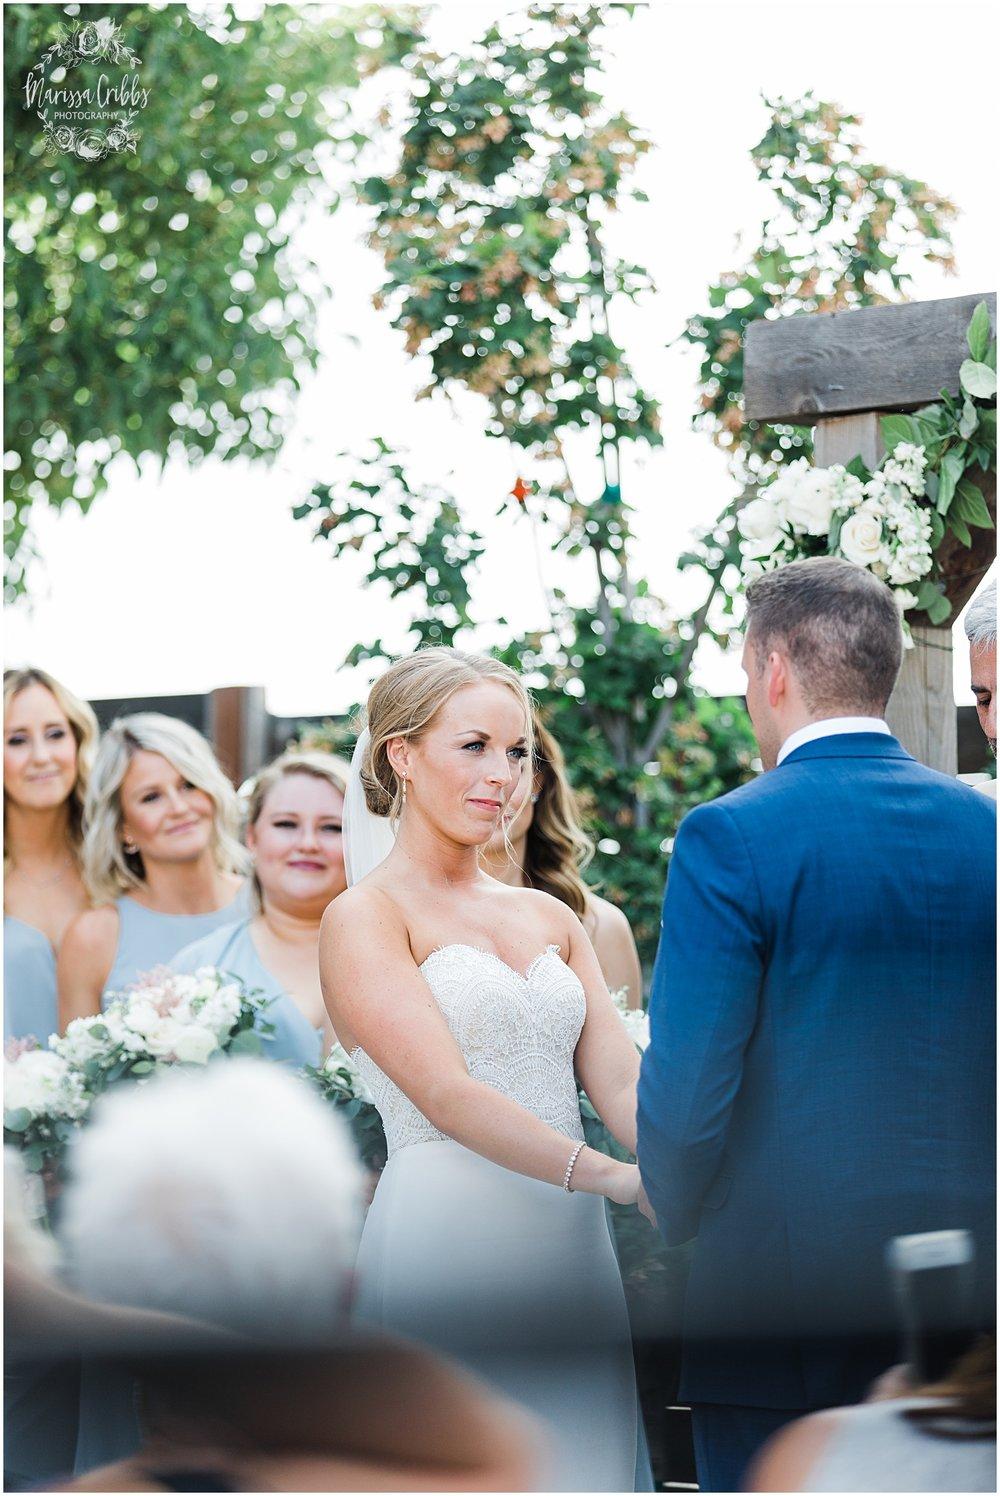 MAGNOLIA VENUE WEDDING | CHARLIE & NATALIE | MARISSA CRIBBS PHOTOGRAPHY_5759.jpg